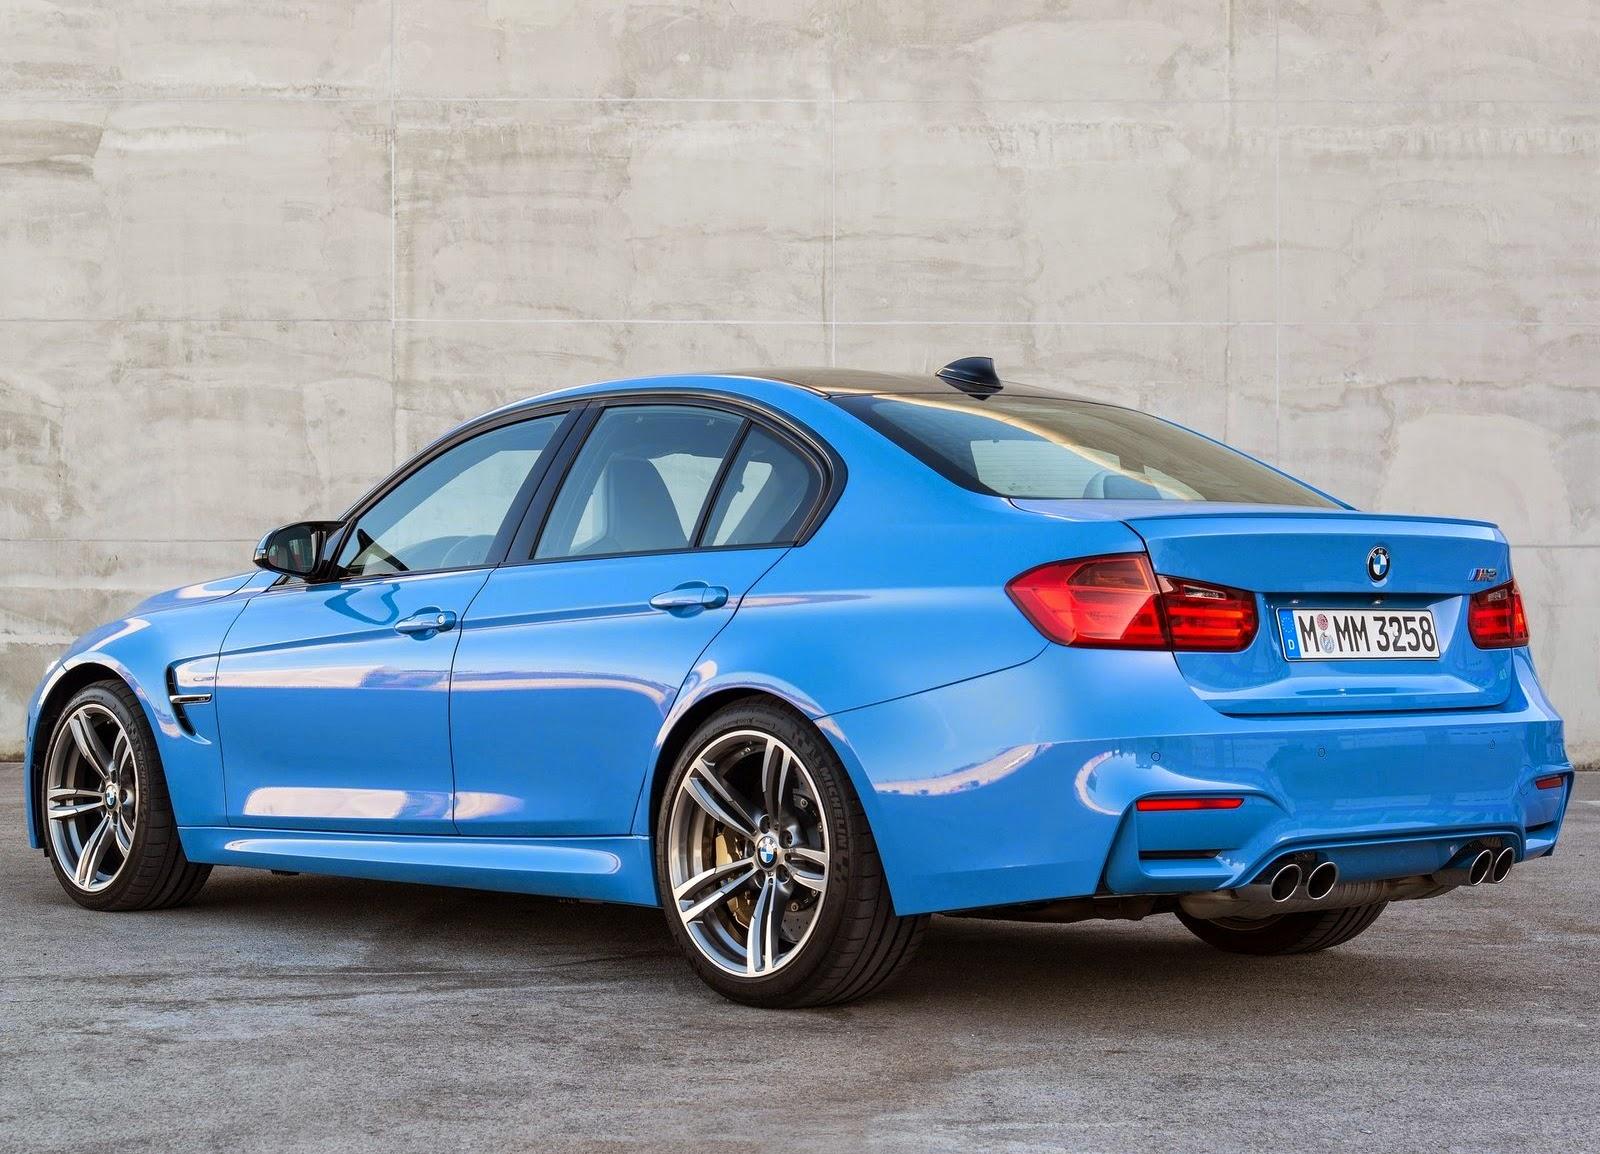 Bmw M3 Hd Wallpaper: BMW M3 Sedan Blue 2015 Car Wallpaper ! Car Wallpaper HD